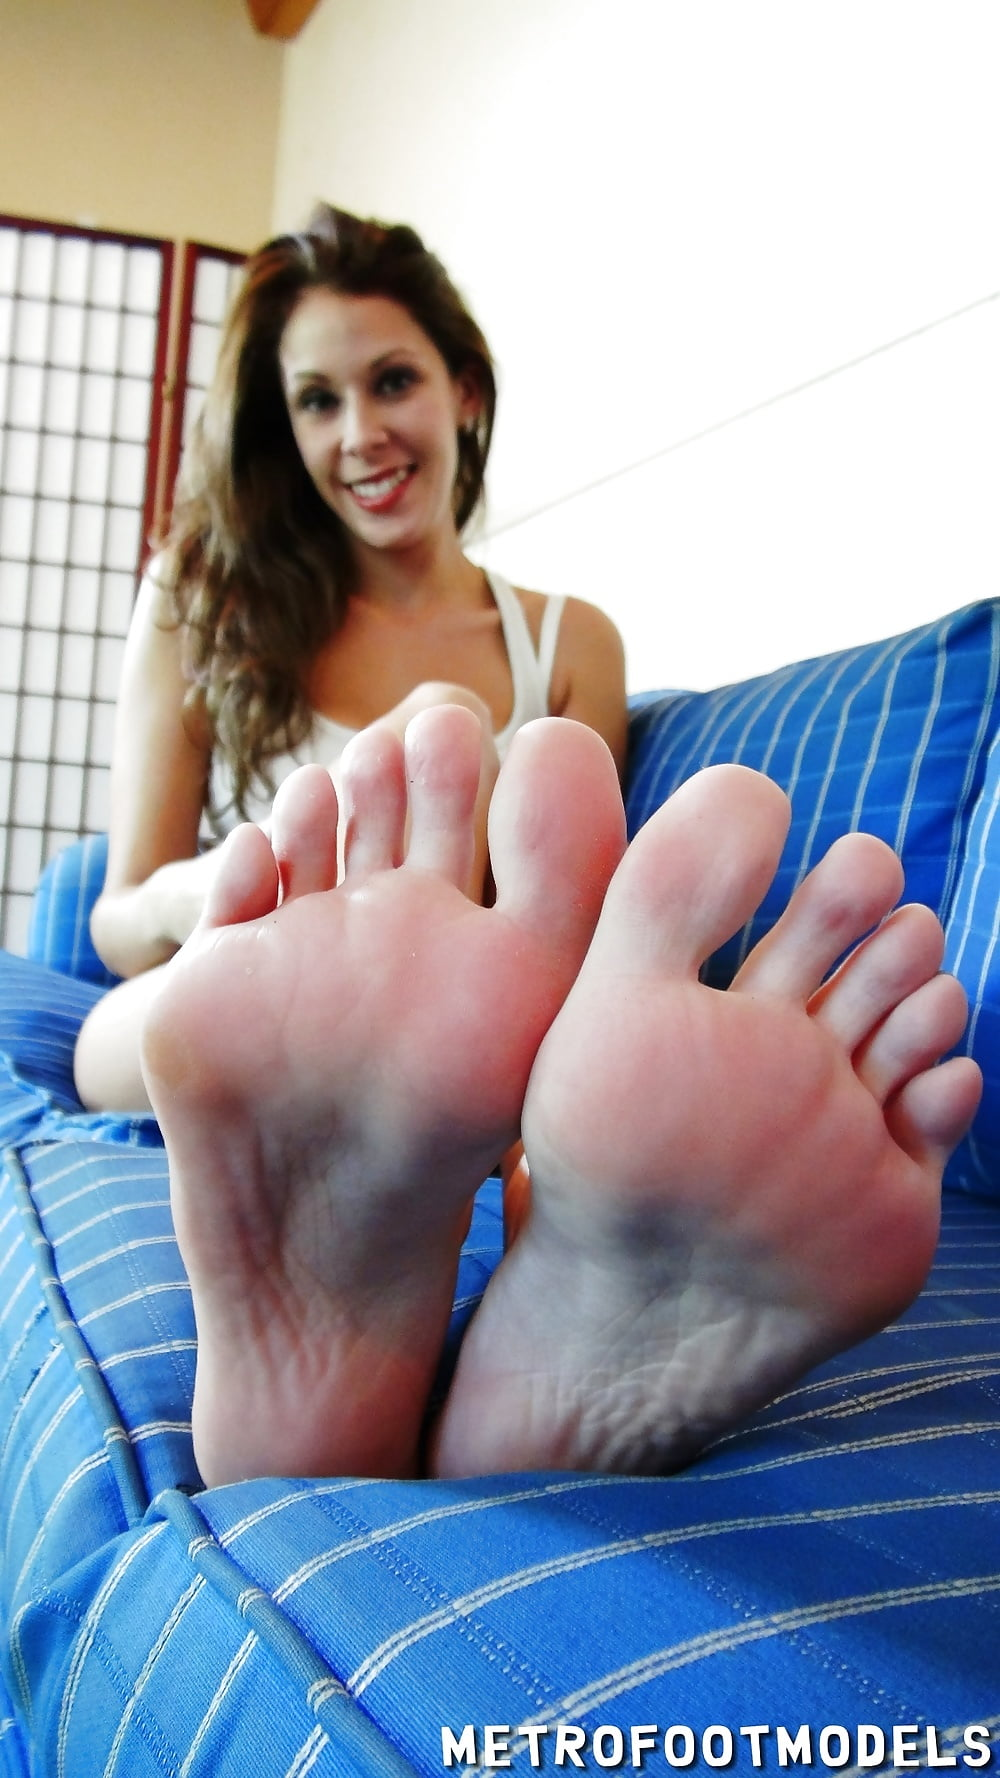 Nikki brooks porn star-8067